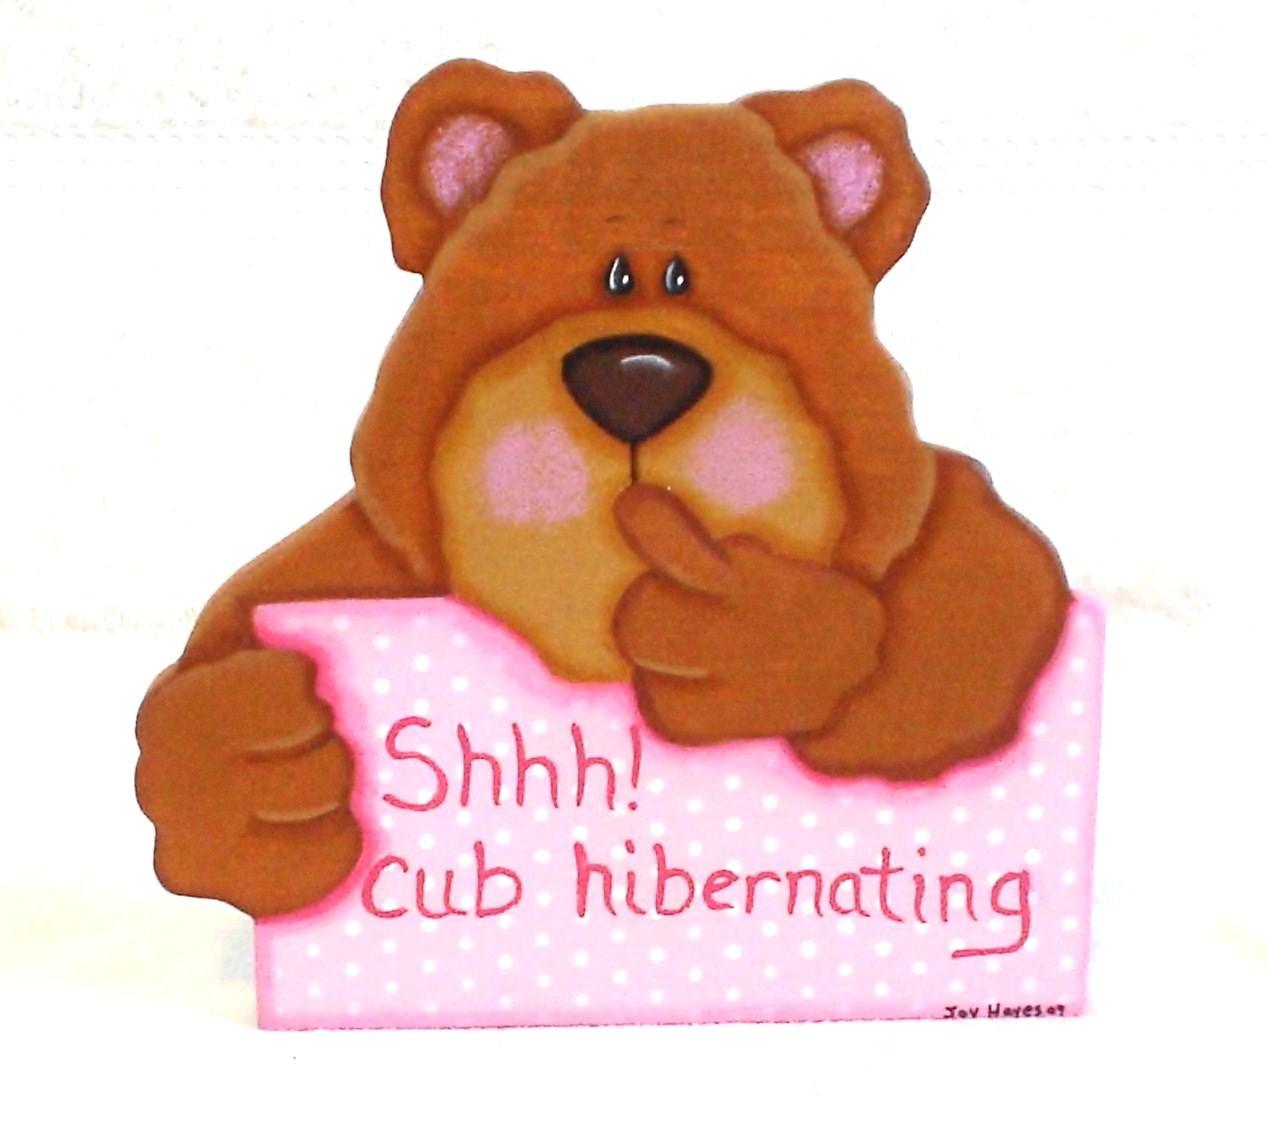 Shhh teddy bear clipart vector royalty free Free Bear Preschool Cliparts, Download Free Clip Art, Free ... vector royalty free